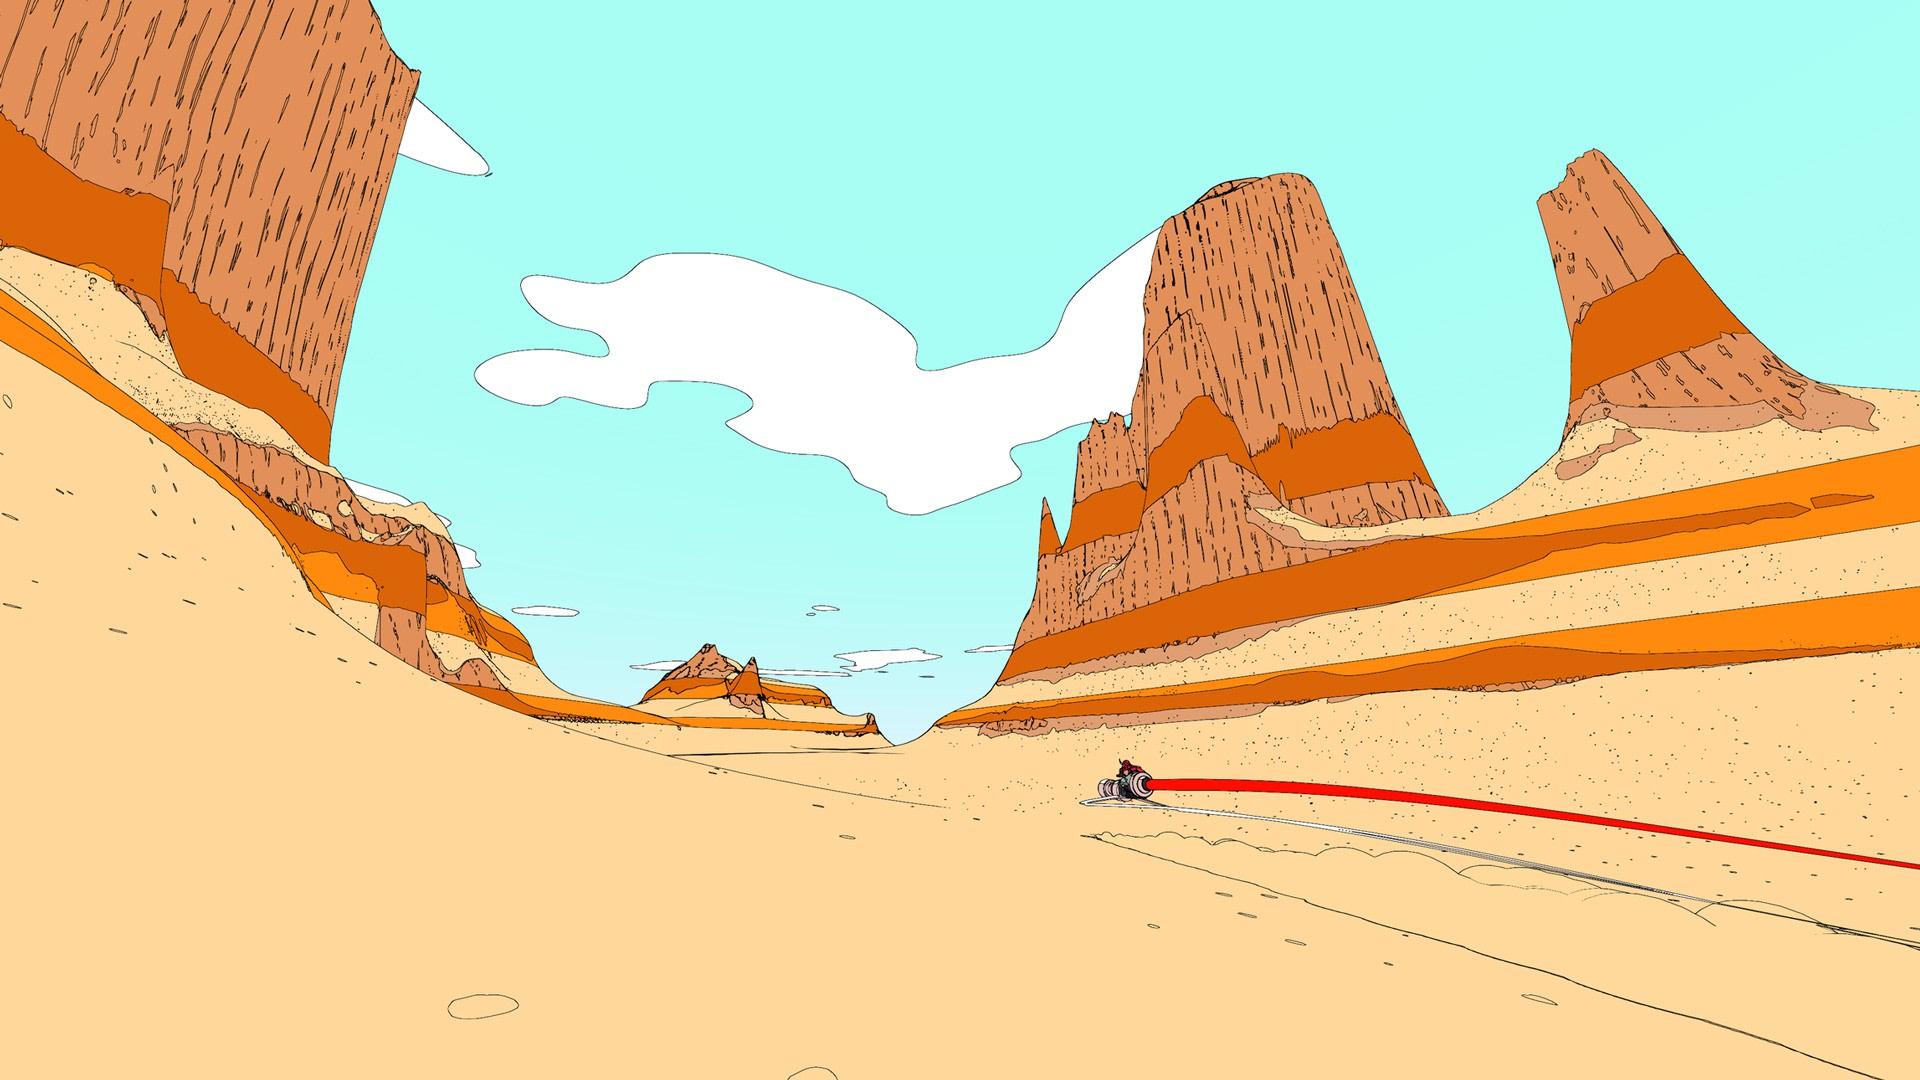 Racing across the desert, Sable